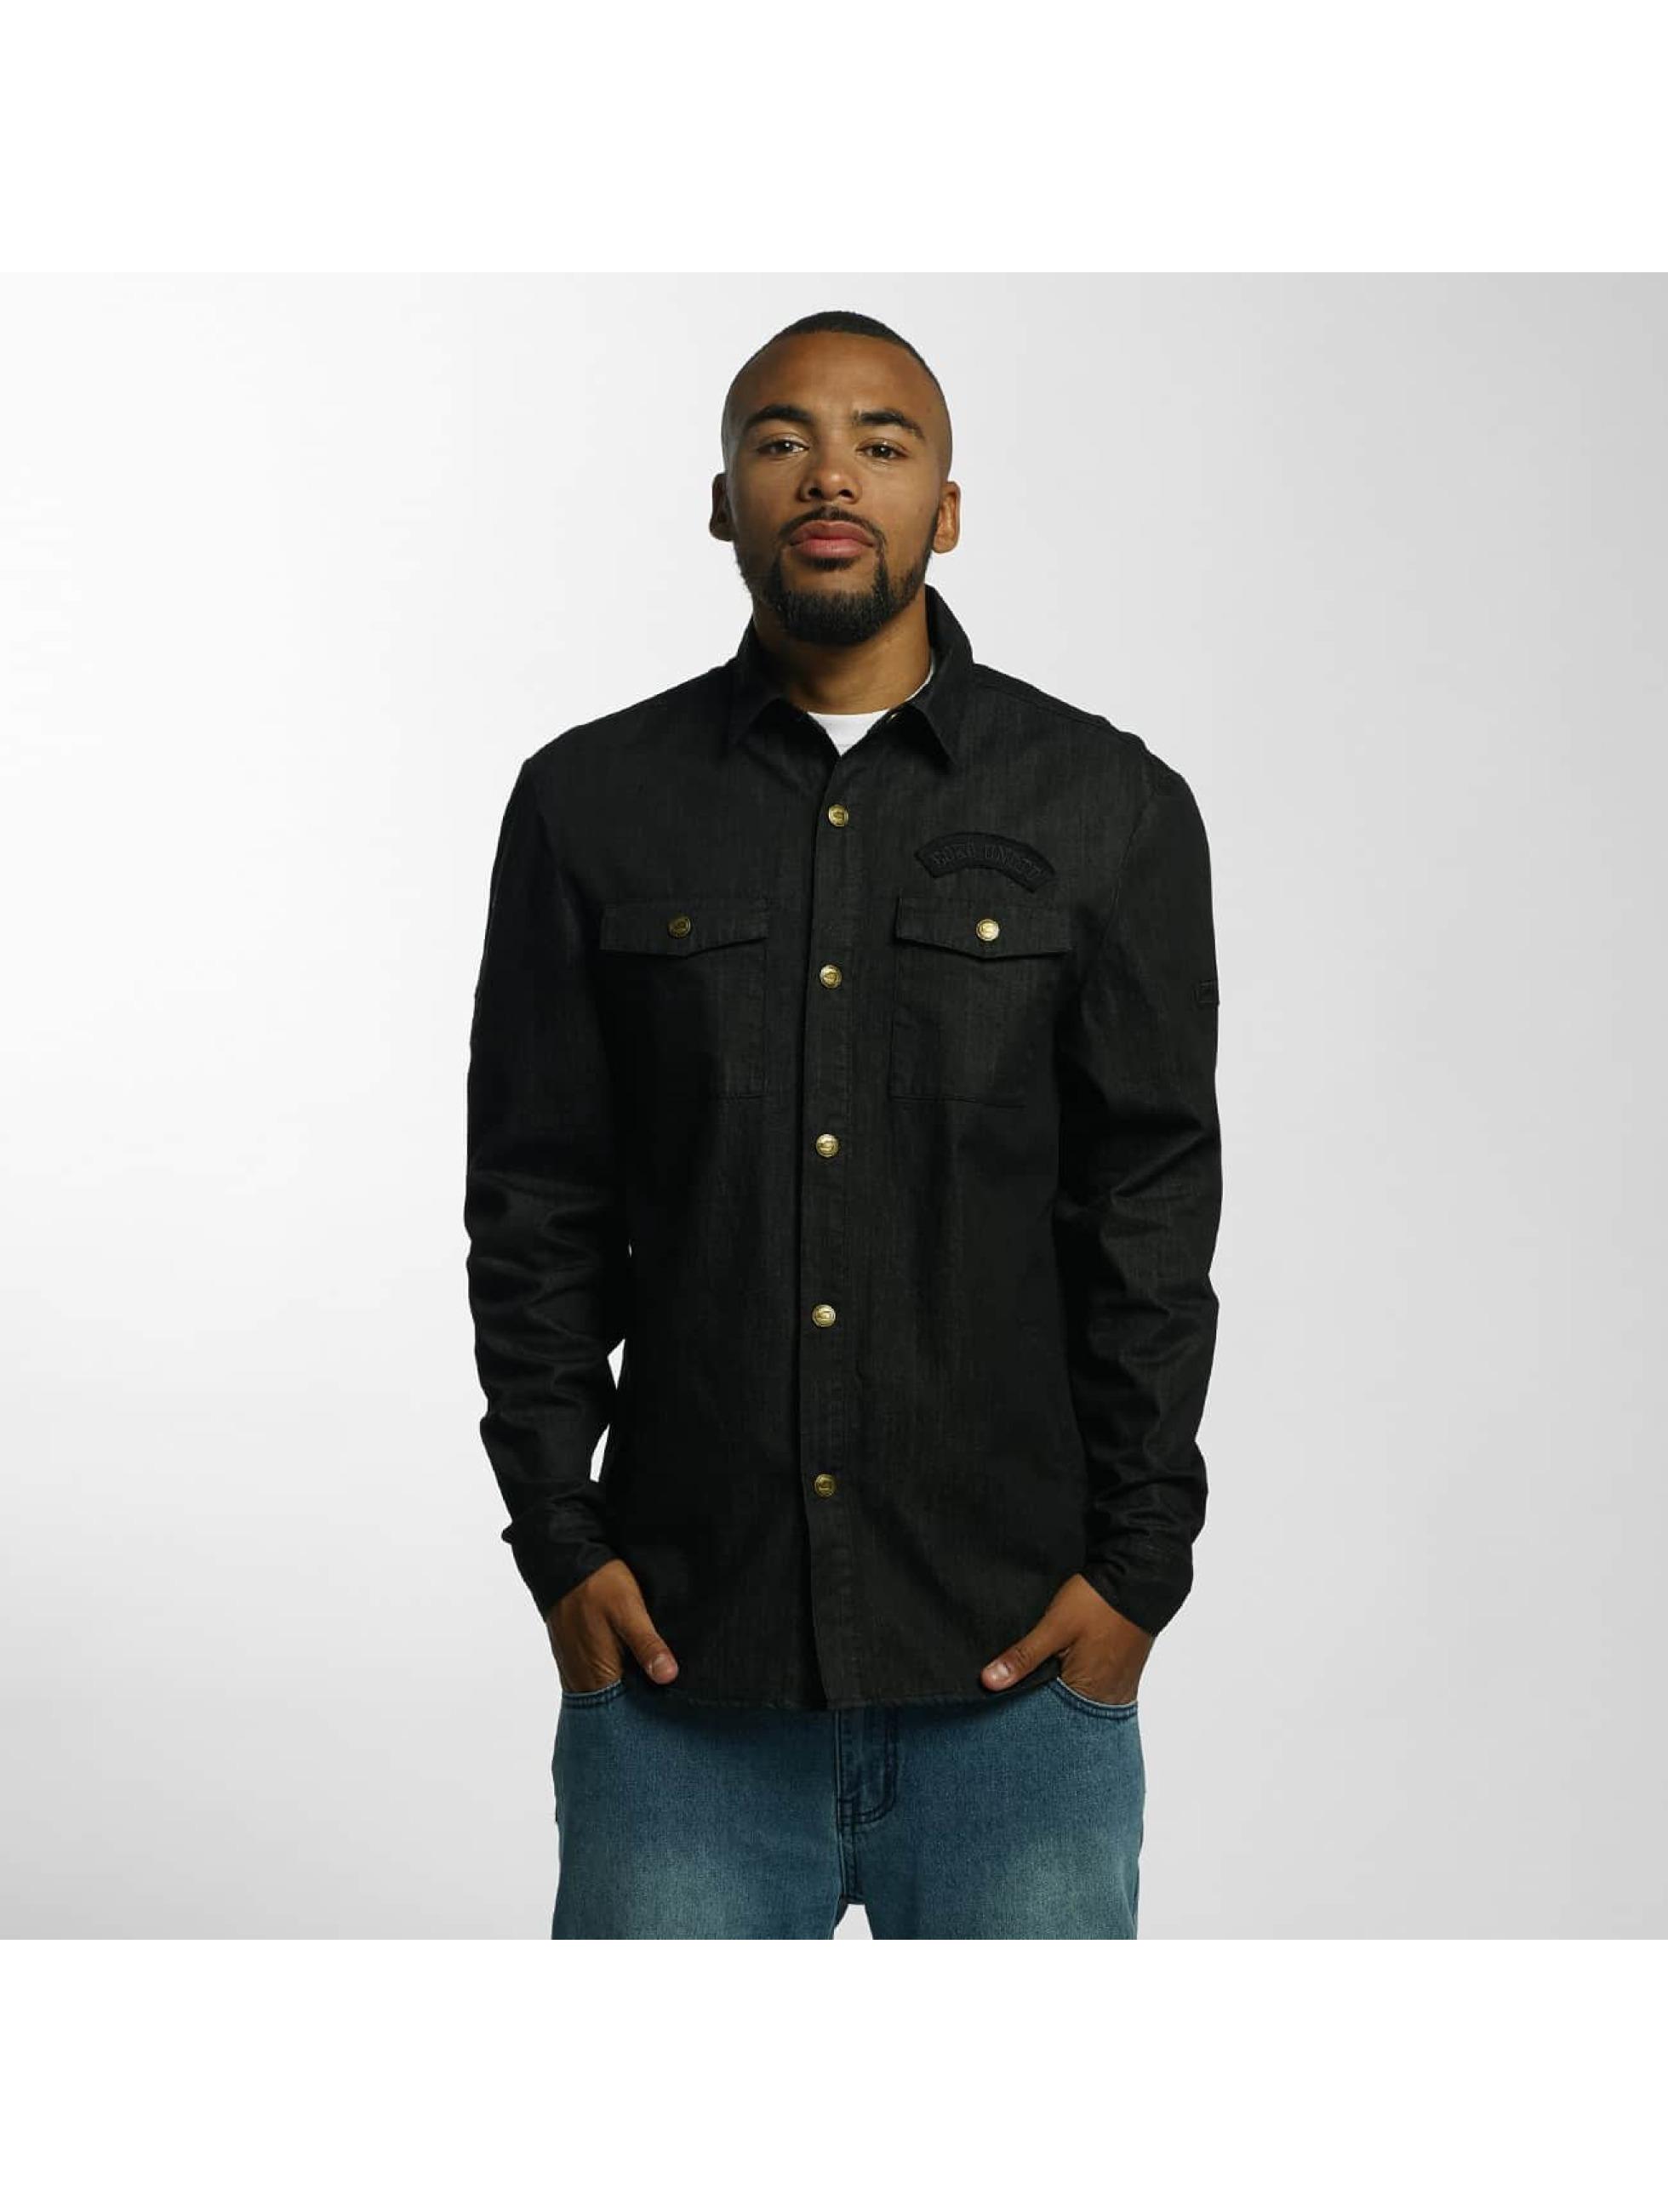 Ecko Unltd. / Shirt Jeans in black XL